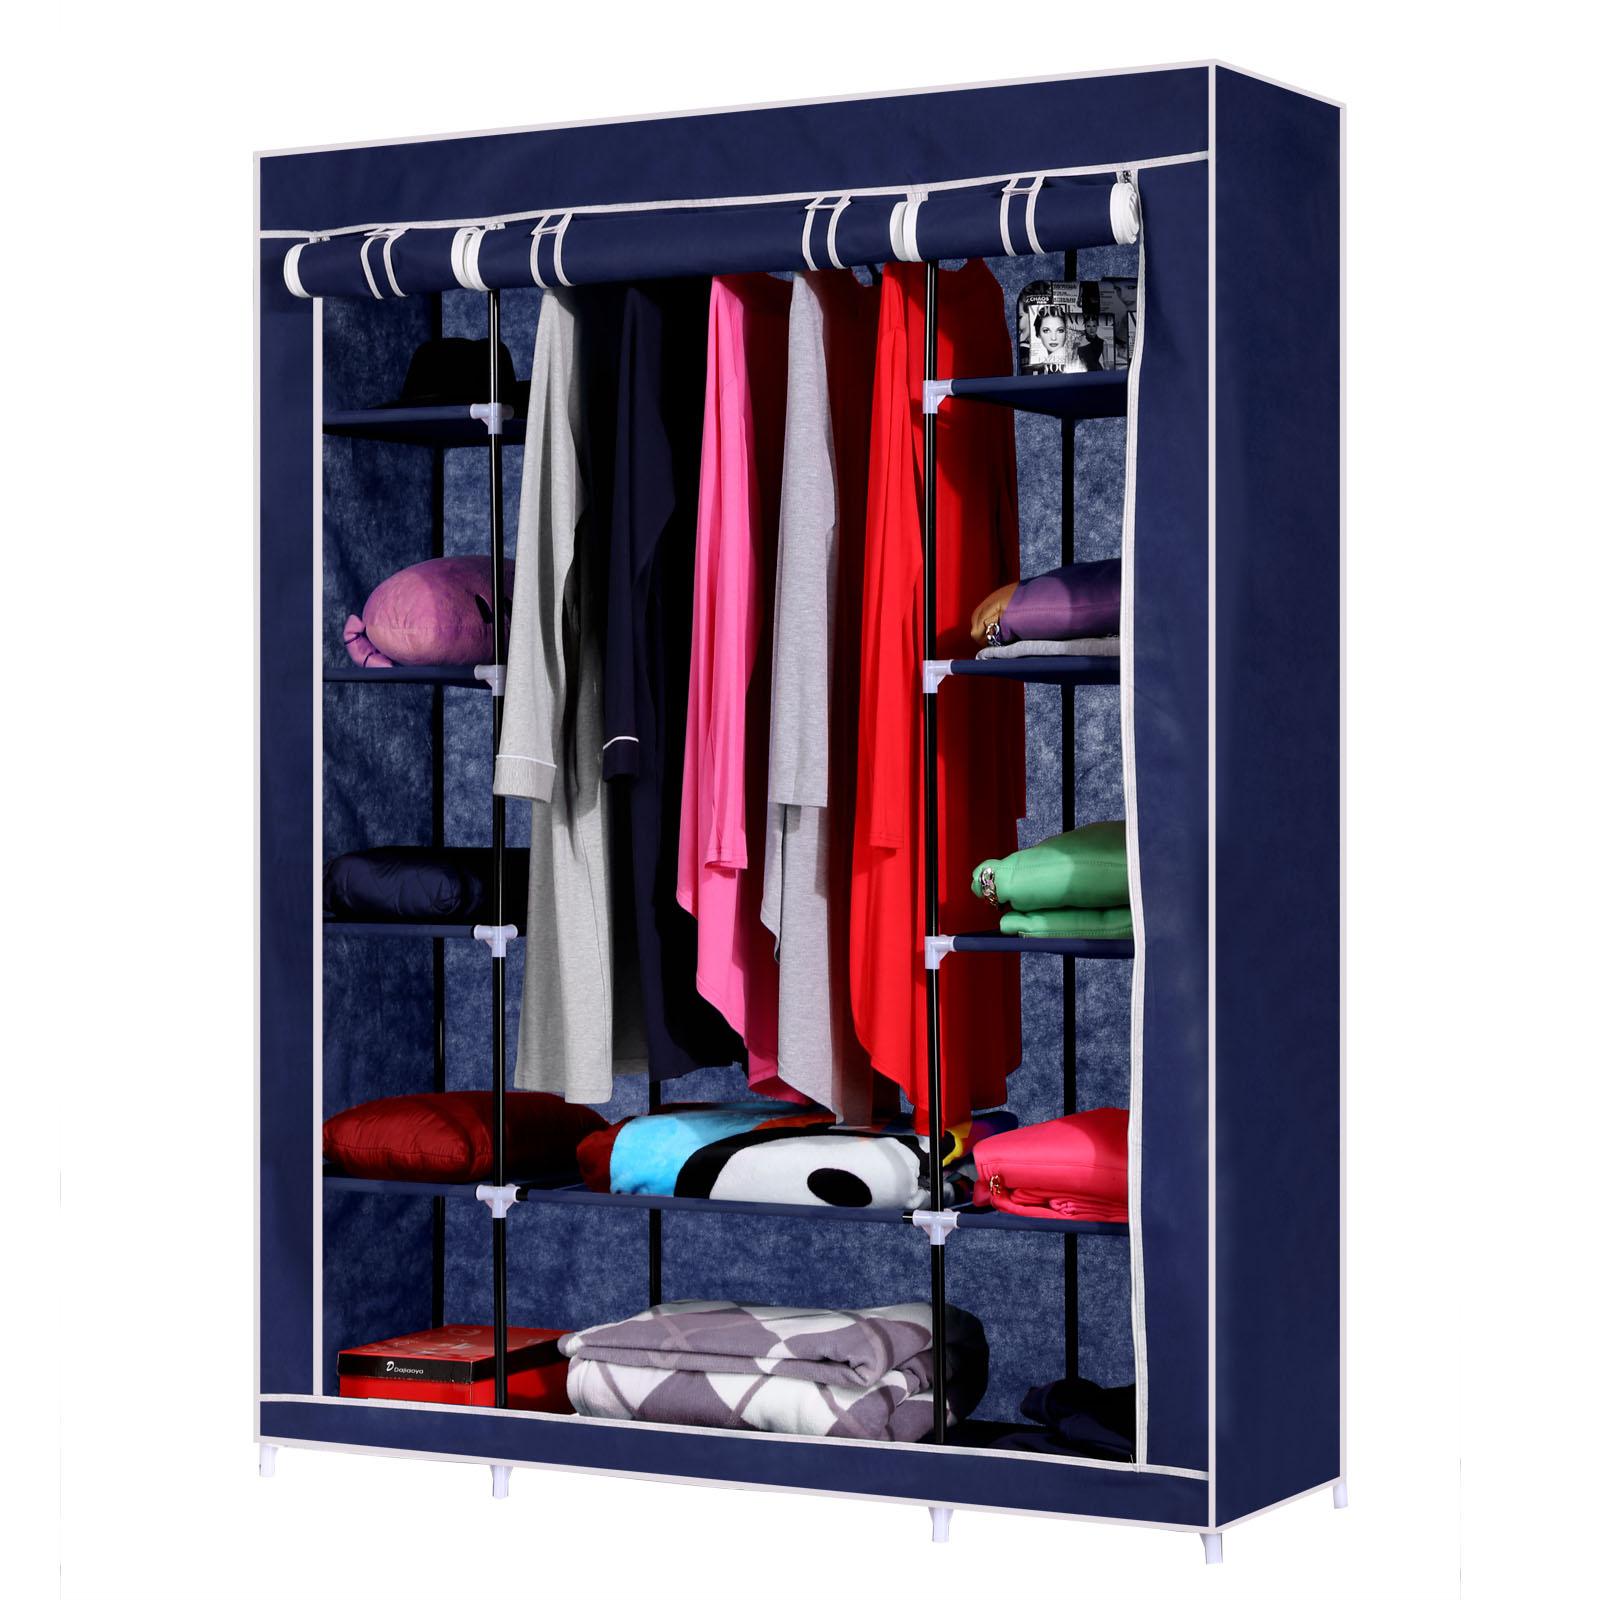 Homdox Bedroom Furniture Folding Cloth Wardrobe Portable Clothes Closet Cloth Cabinet Large Capacity Wardrobes(China (Mainland))